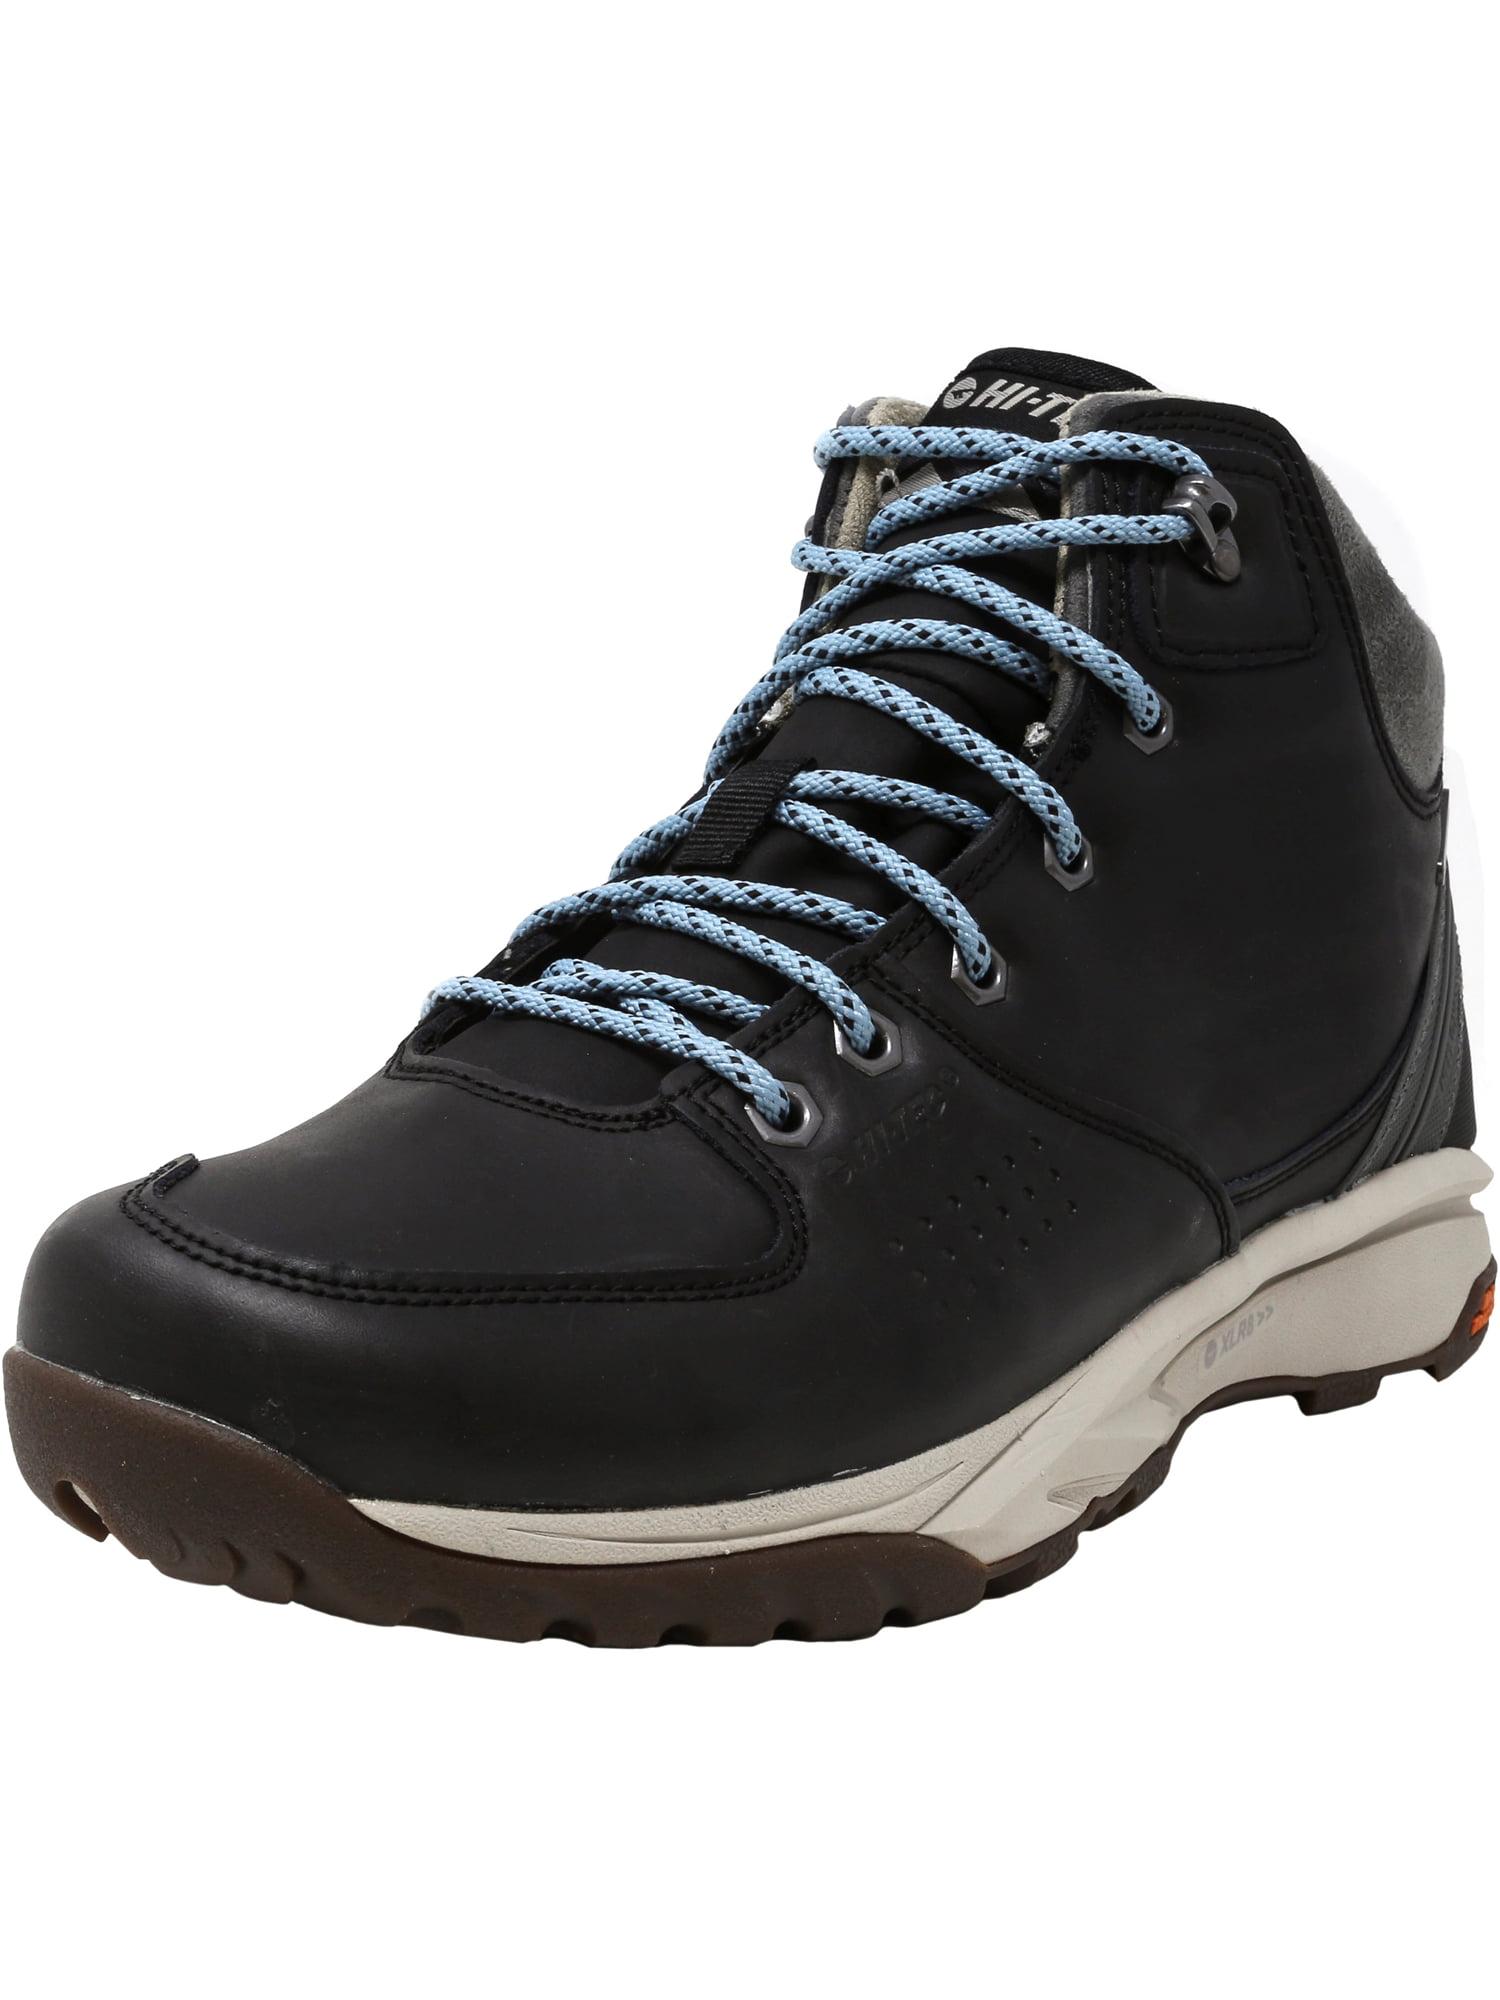 Hi-Tec Women's Wild-Life Lux I Waterproof Black High-Top Leather Hiking Boot 7.5M by Hi-Tec